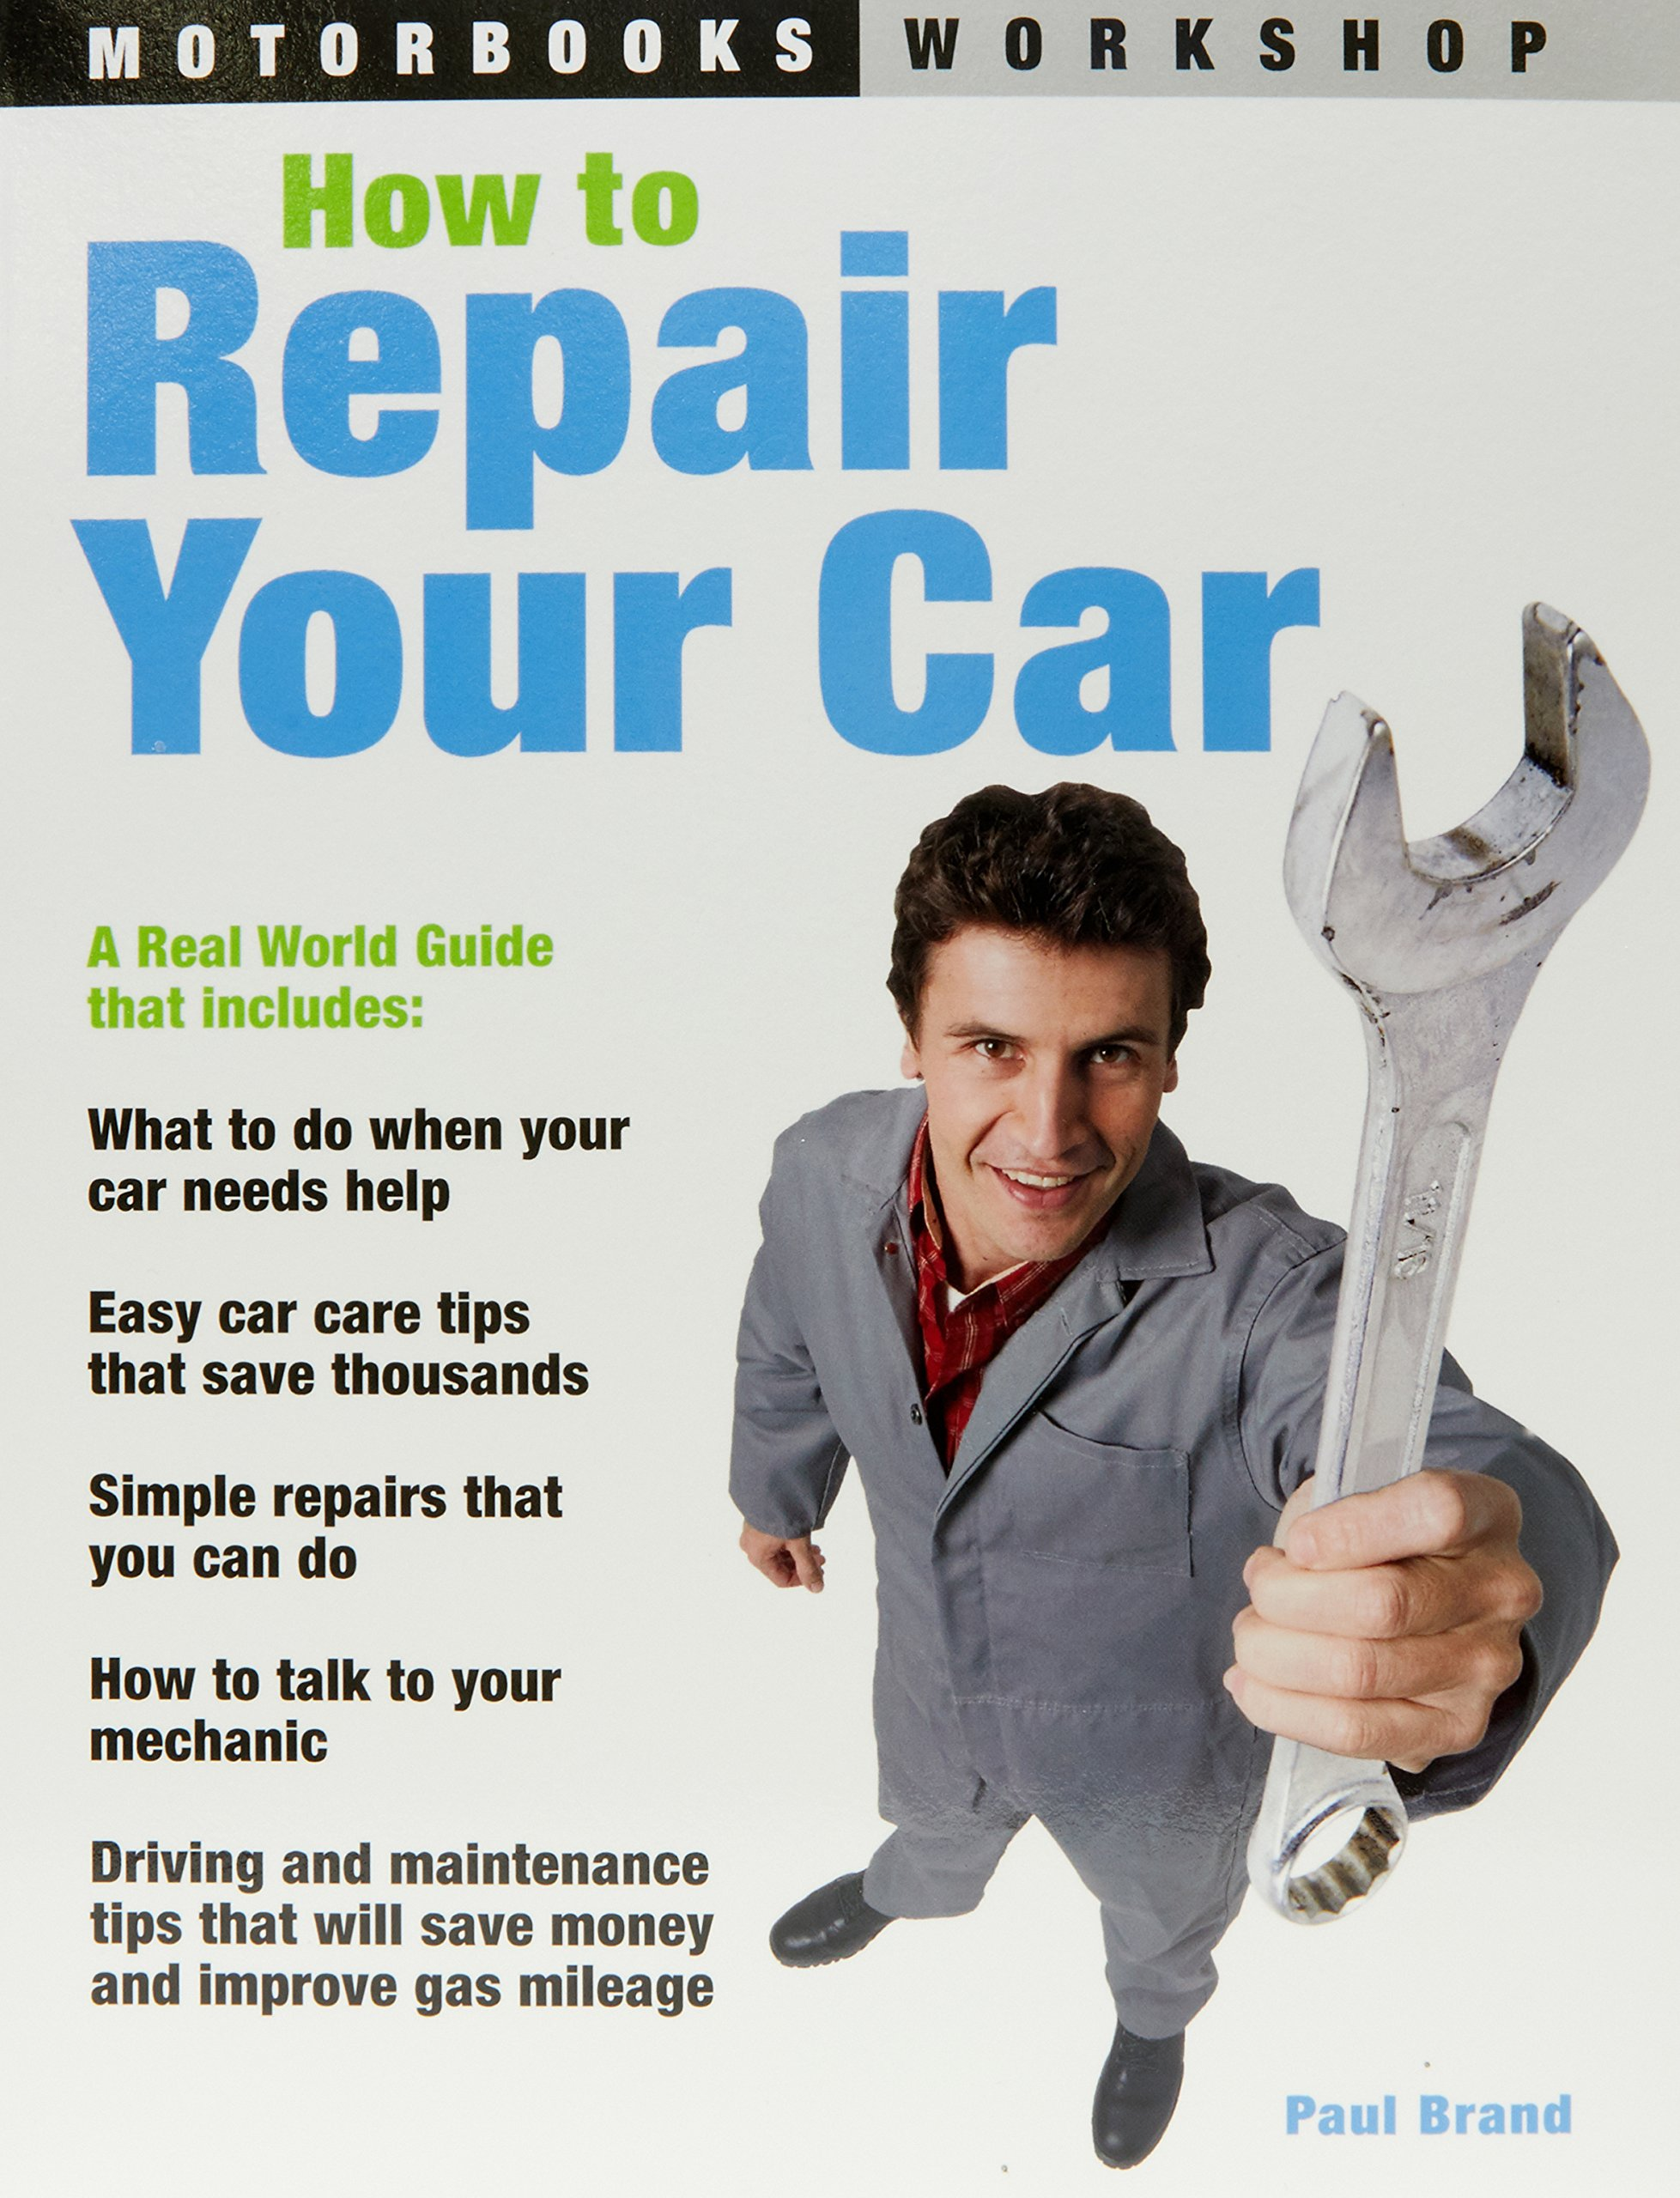 How to Repair Your Car (Motorbooks Workshop): Paul Brand: 9780760322734:  Amazon.com: Books